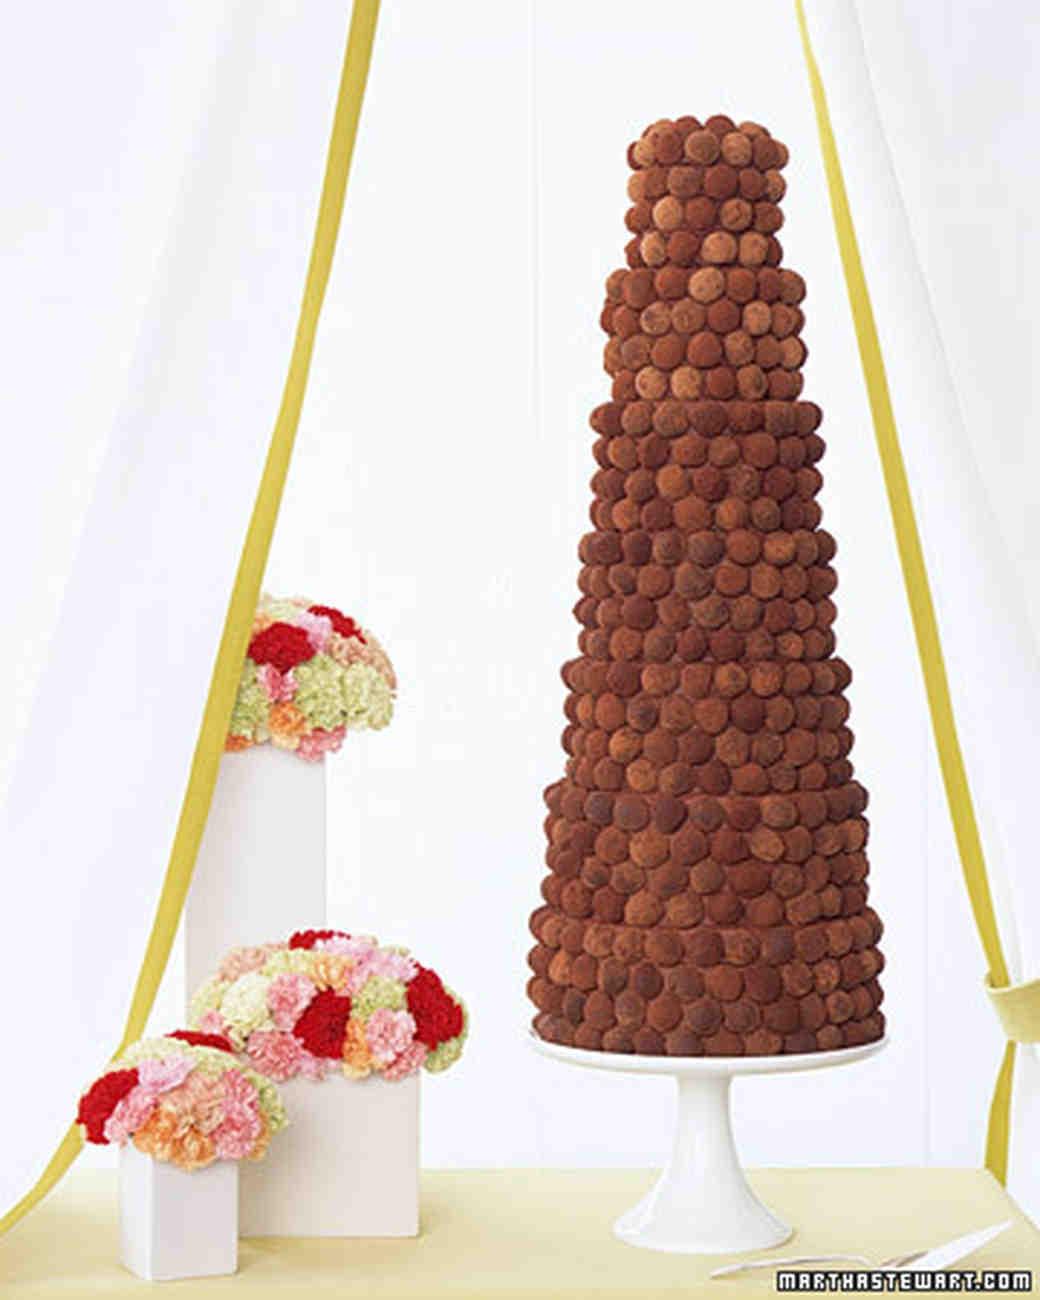 Chocolate Truffles for Truffle Cake